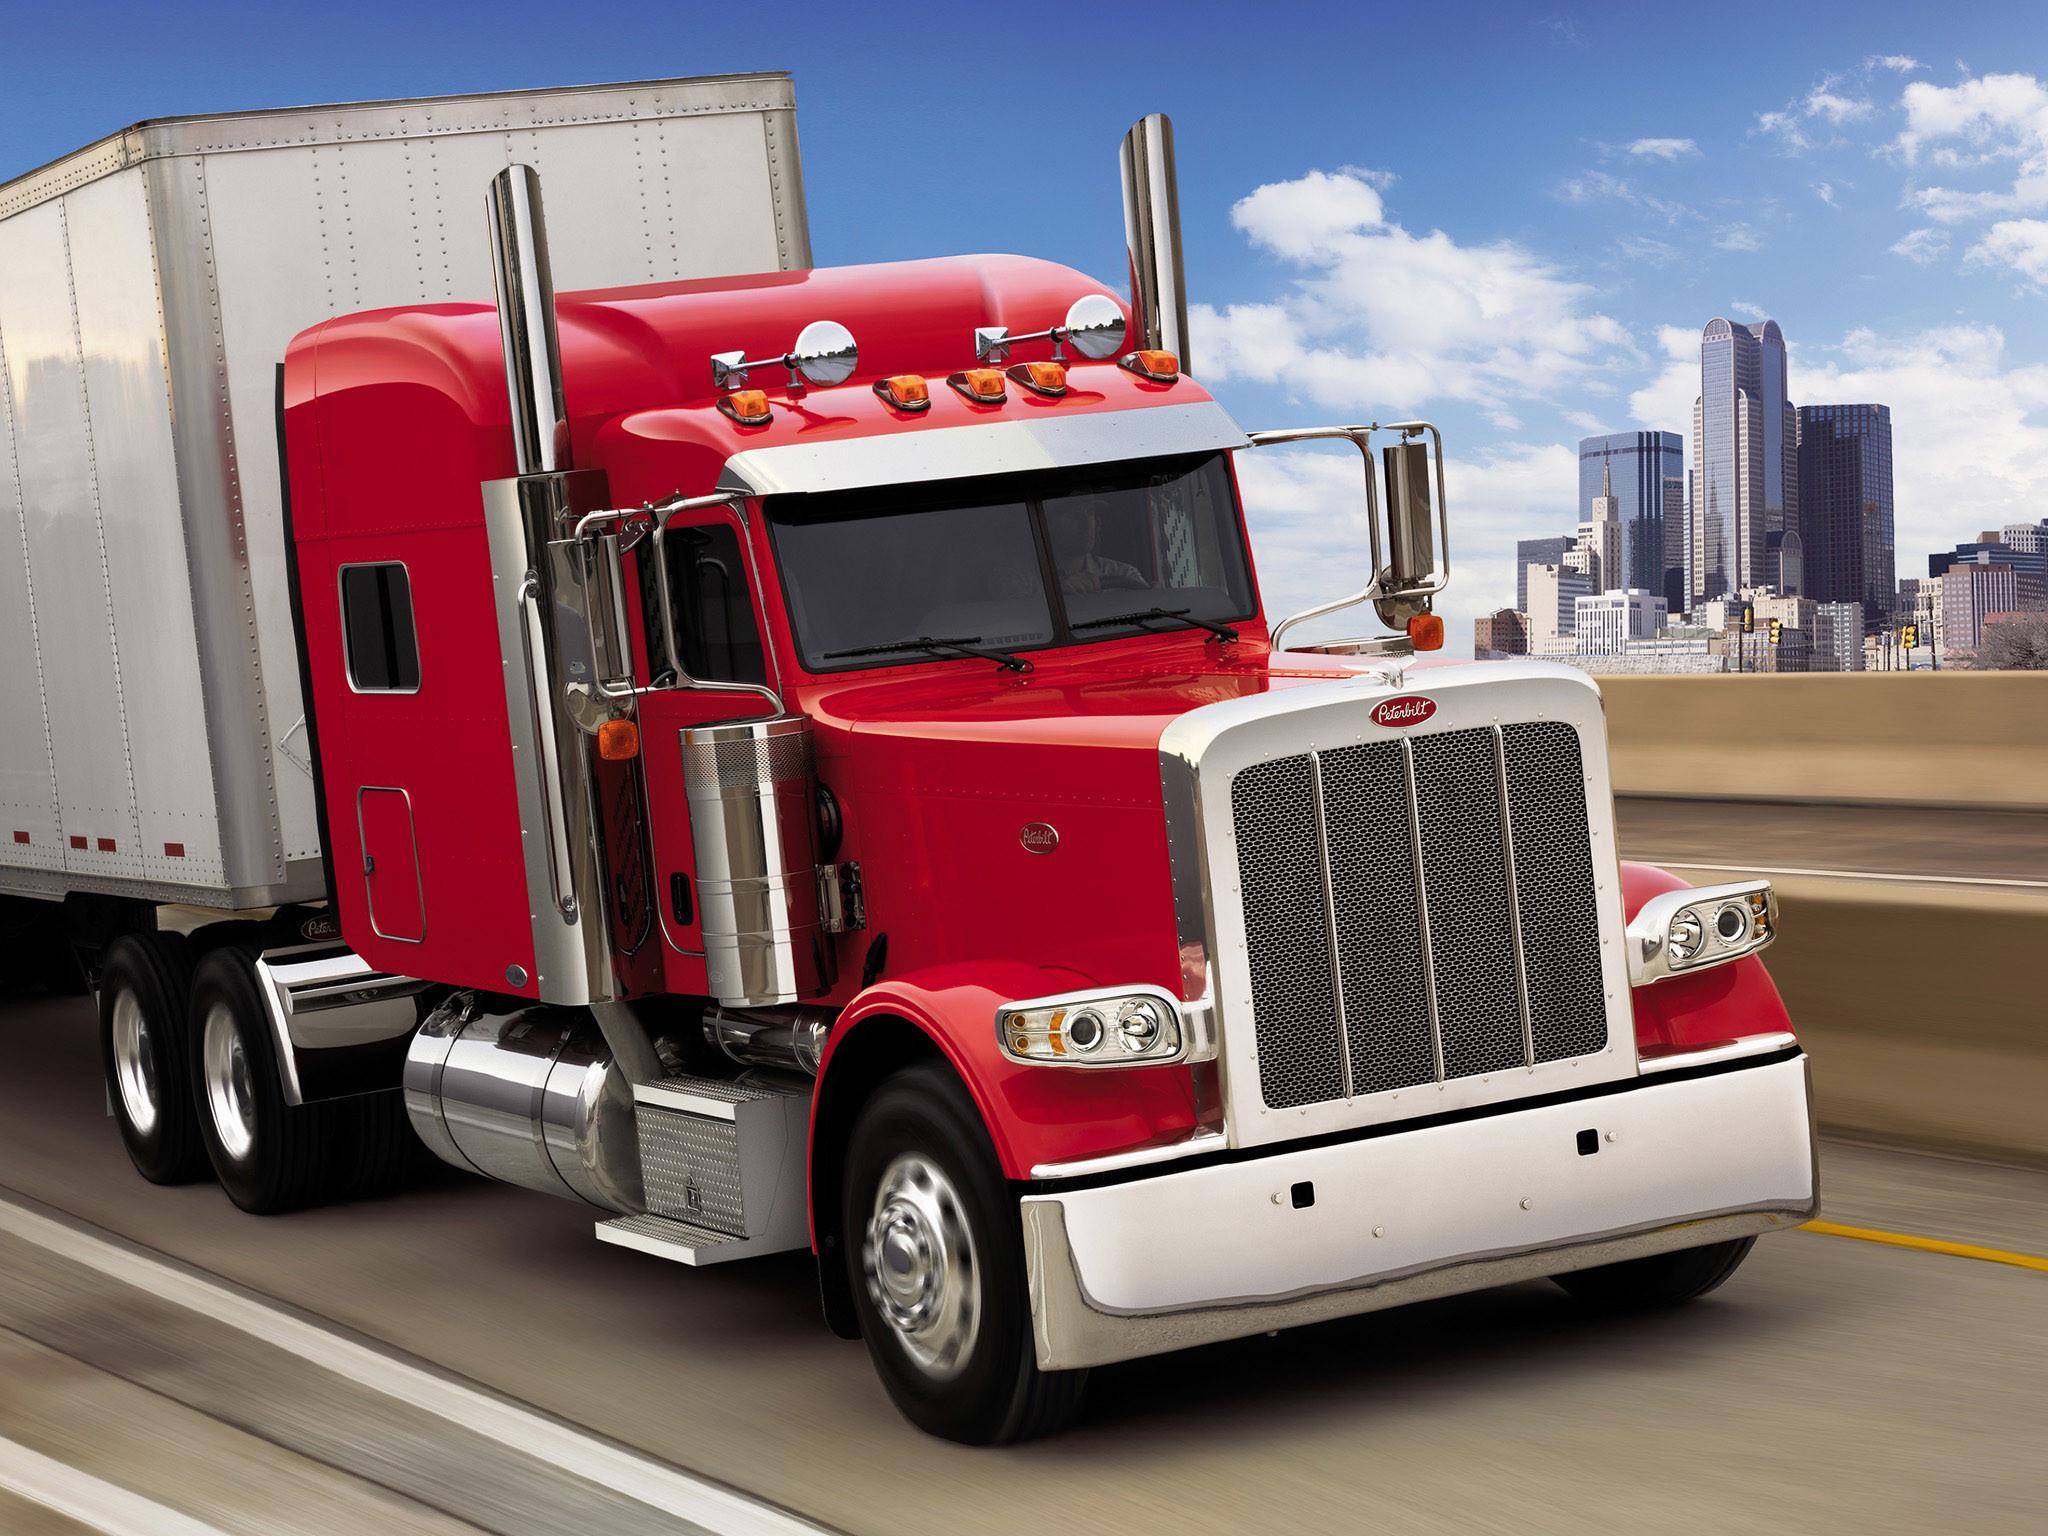 2007 Peterbilt 389 Semi Truck Tractor Wallpaper 2048×1536